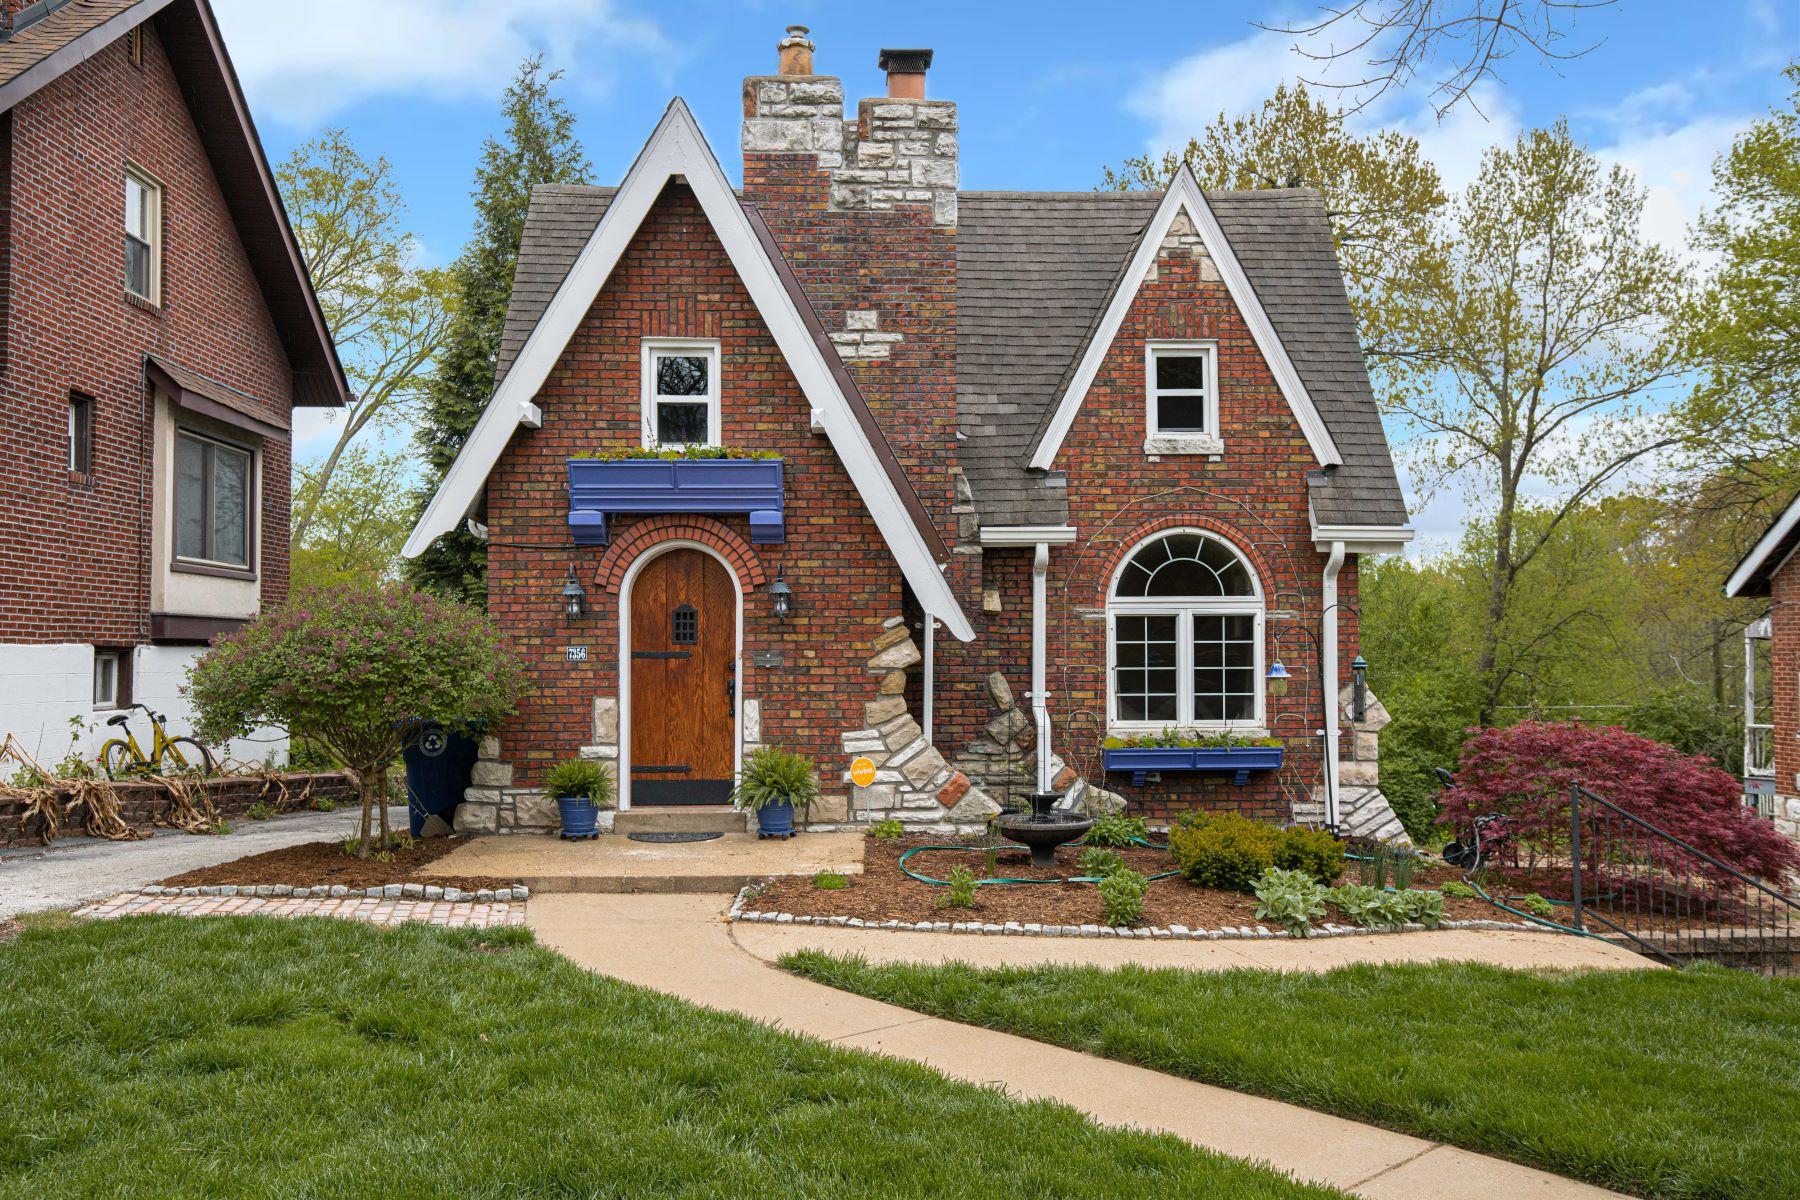 Single Family Homes for Sale at Storybook Tudor 7356 Wellington Avenue University City, Missouri 63130 United States